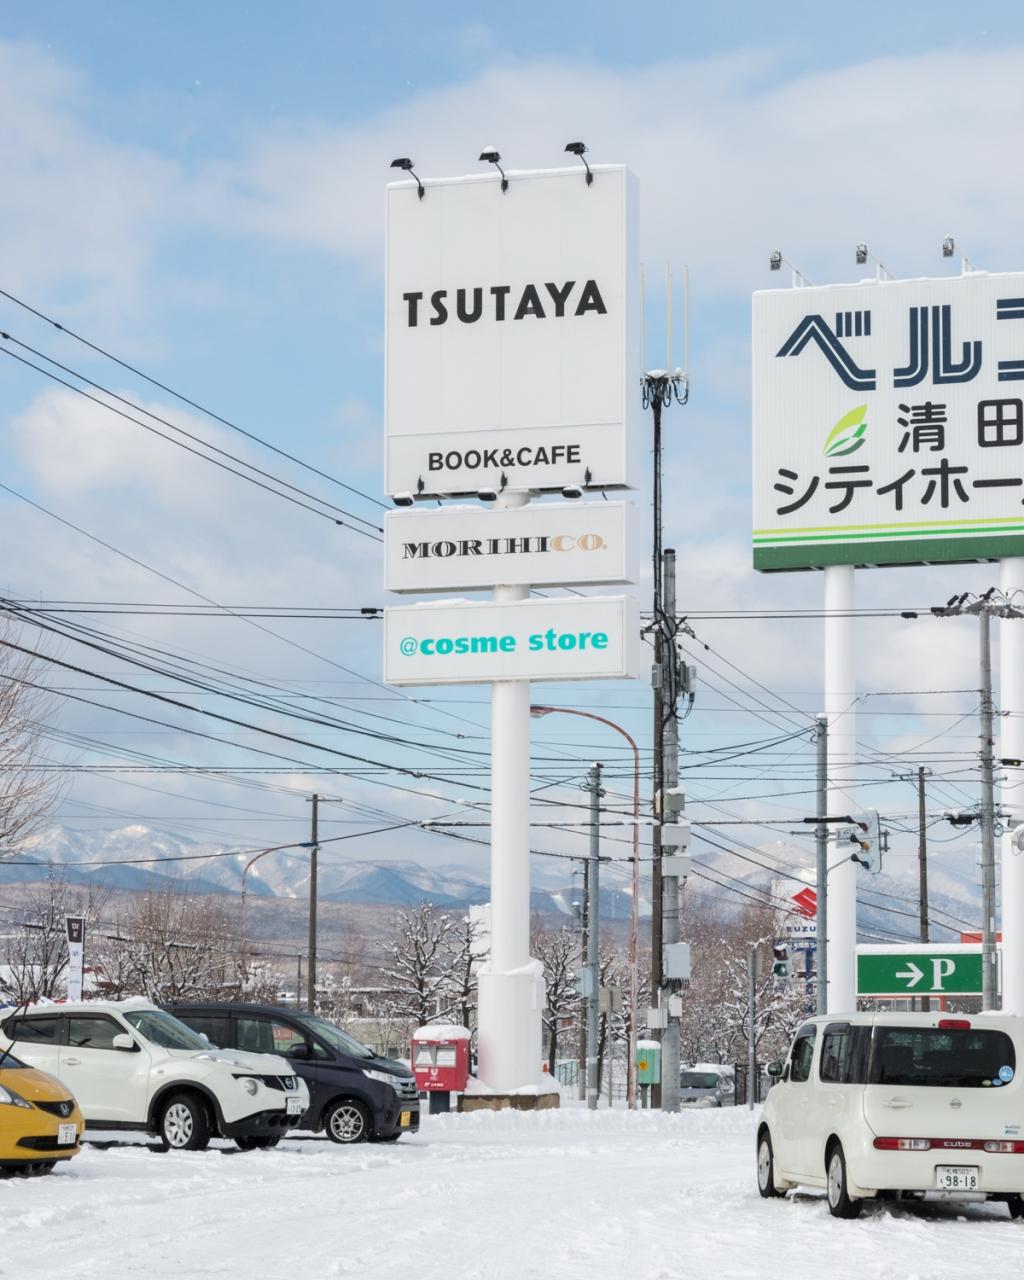 FRANÇOIS CAVELIER Tsutaya. Sapporo. MONOCLE